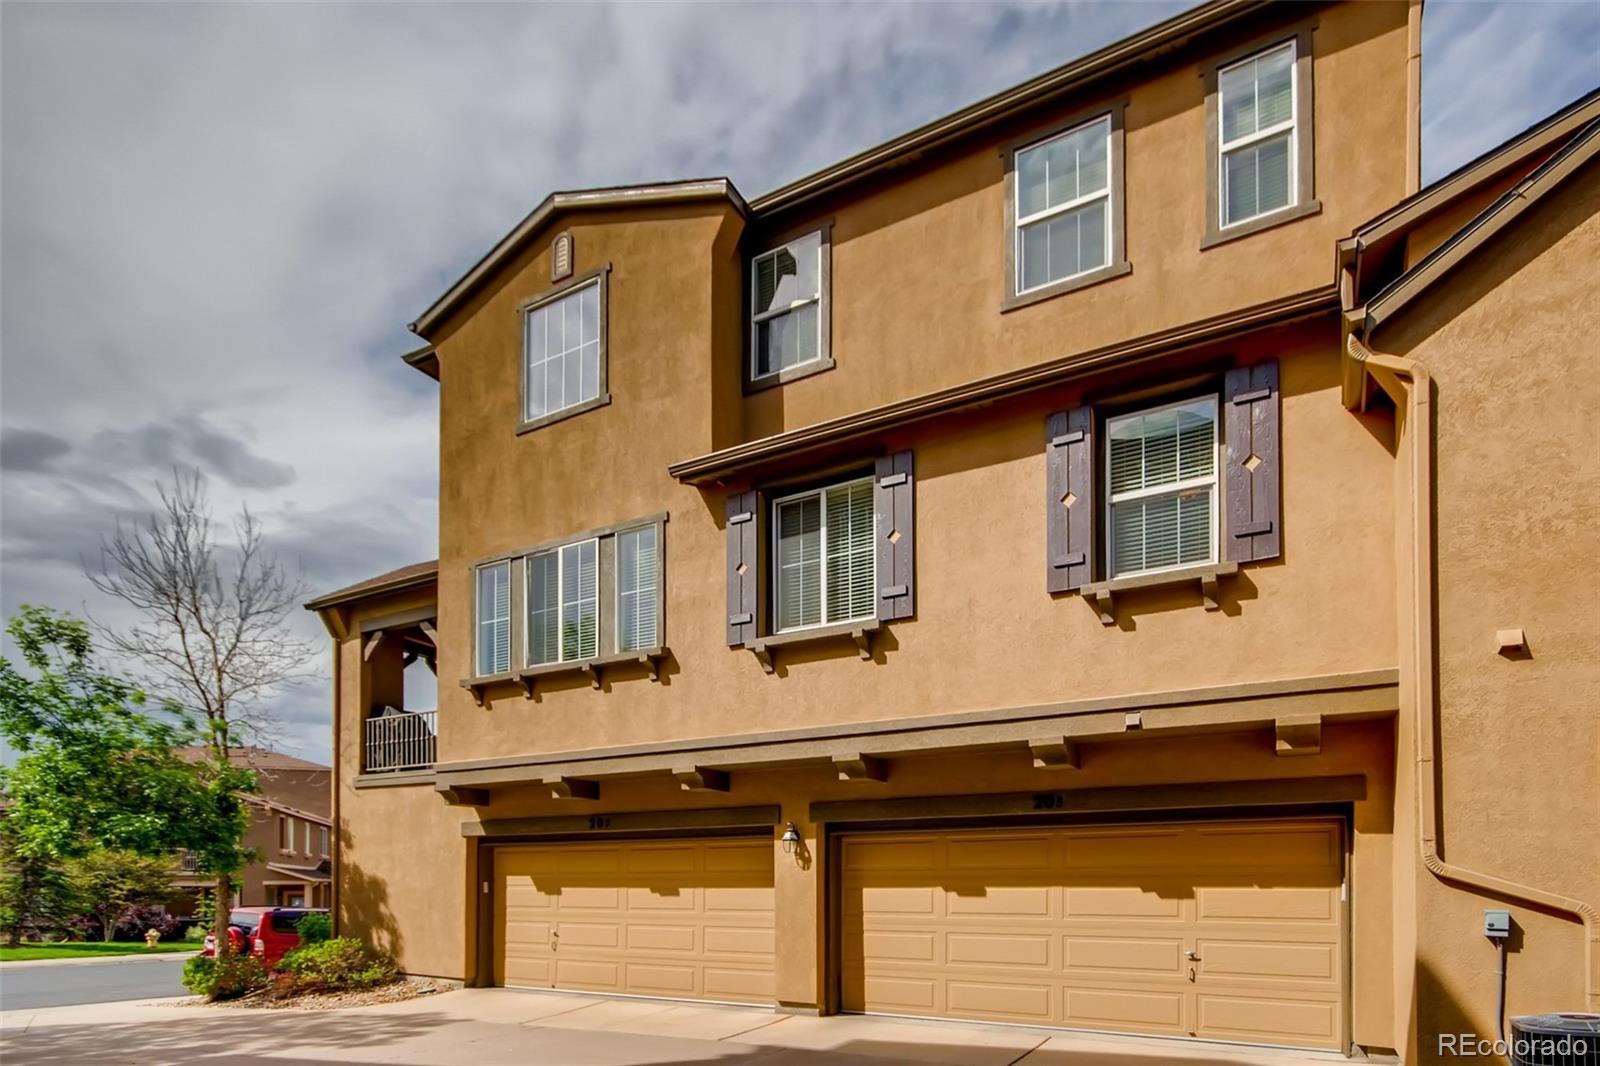 MLS# 4234095 - 29 - 10546 Graymont Lane #D, Highlands Ranch, CO 80126